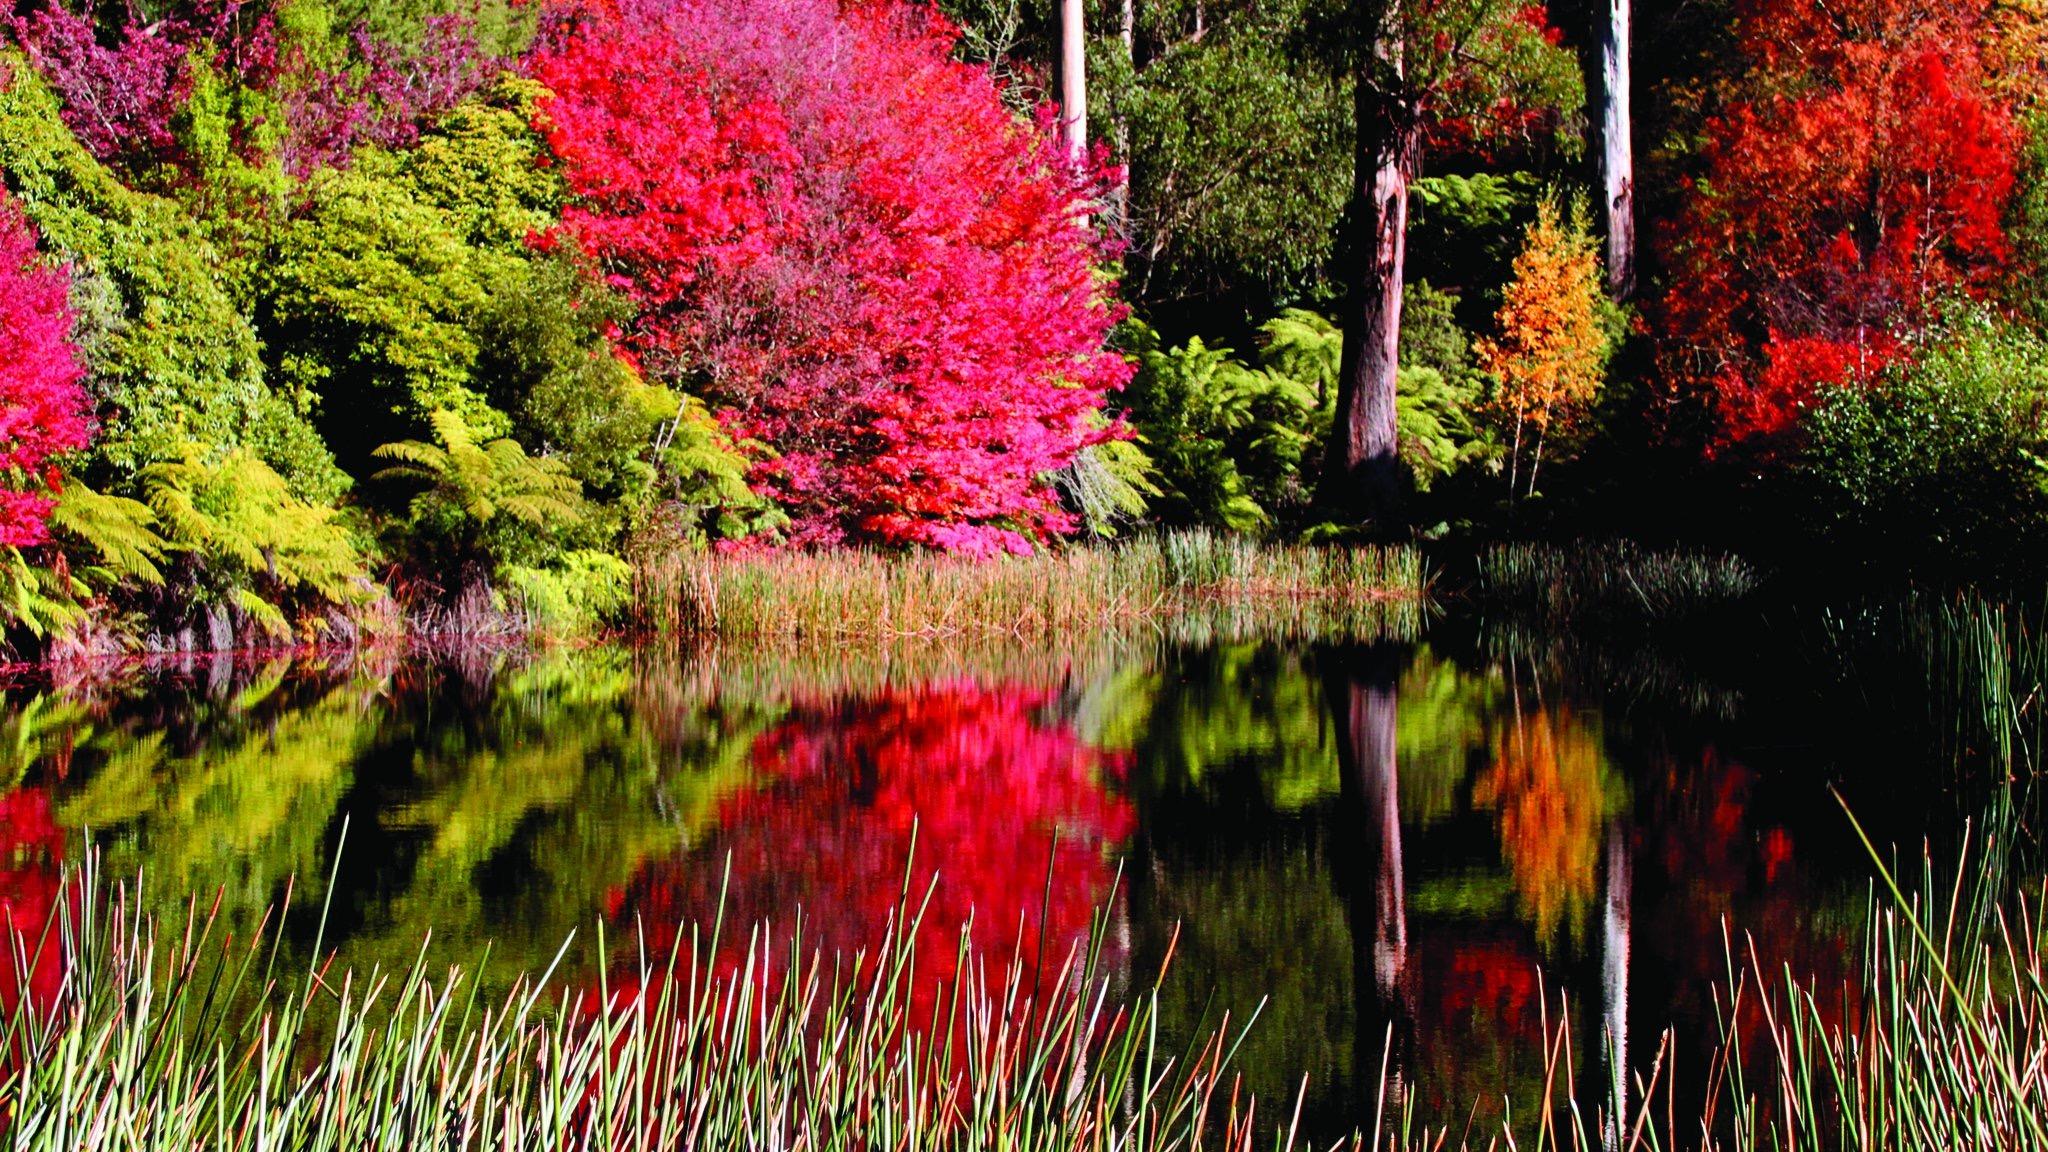 National Rhododenron Garden Olinda